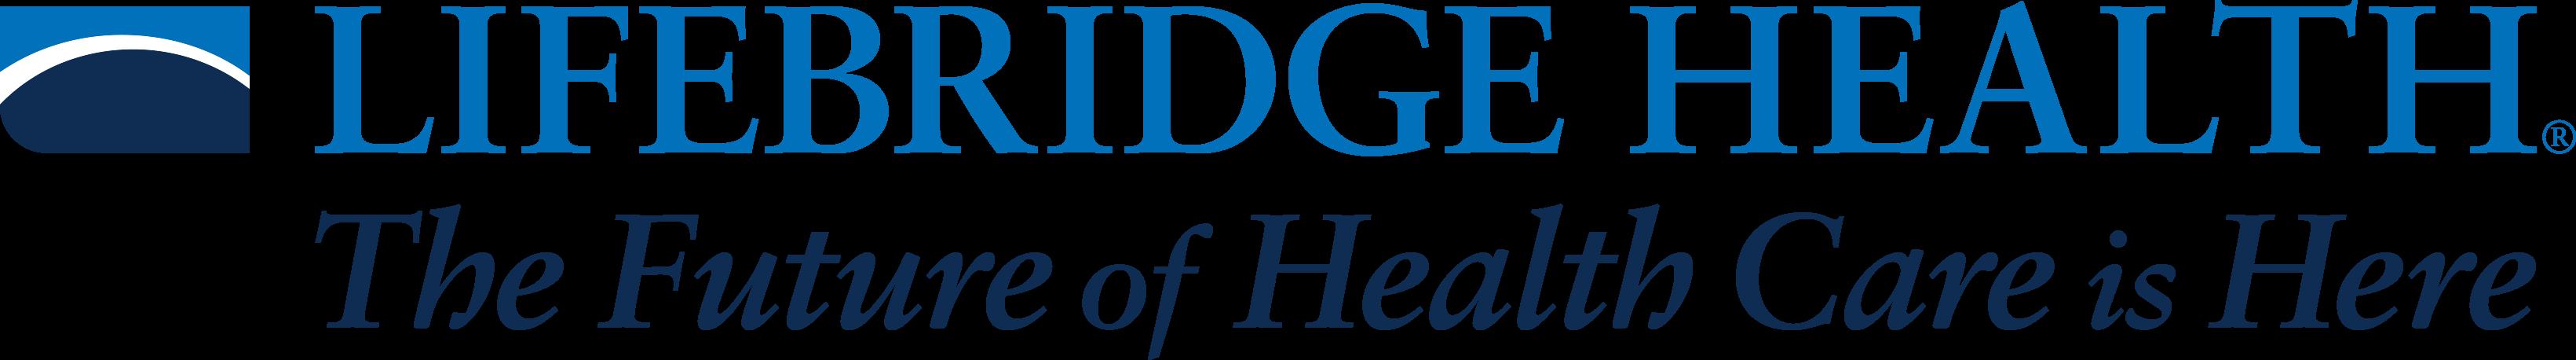 LBH_BRAND_HORIZ_BIGTAG_logo